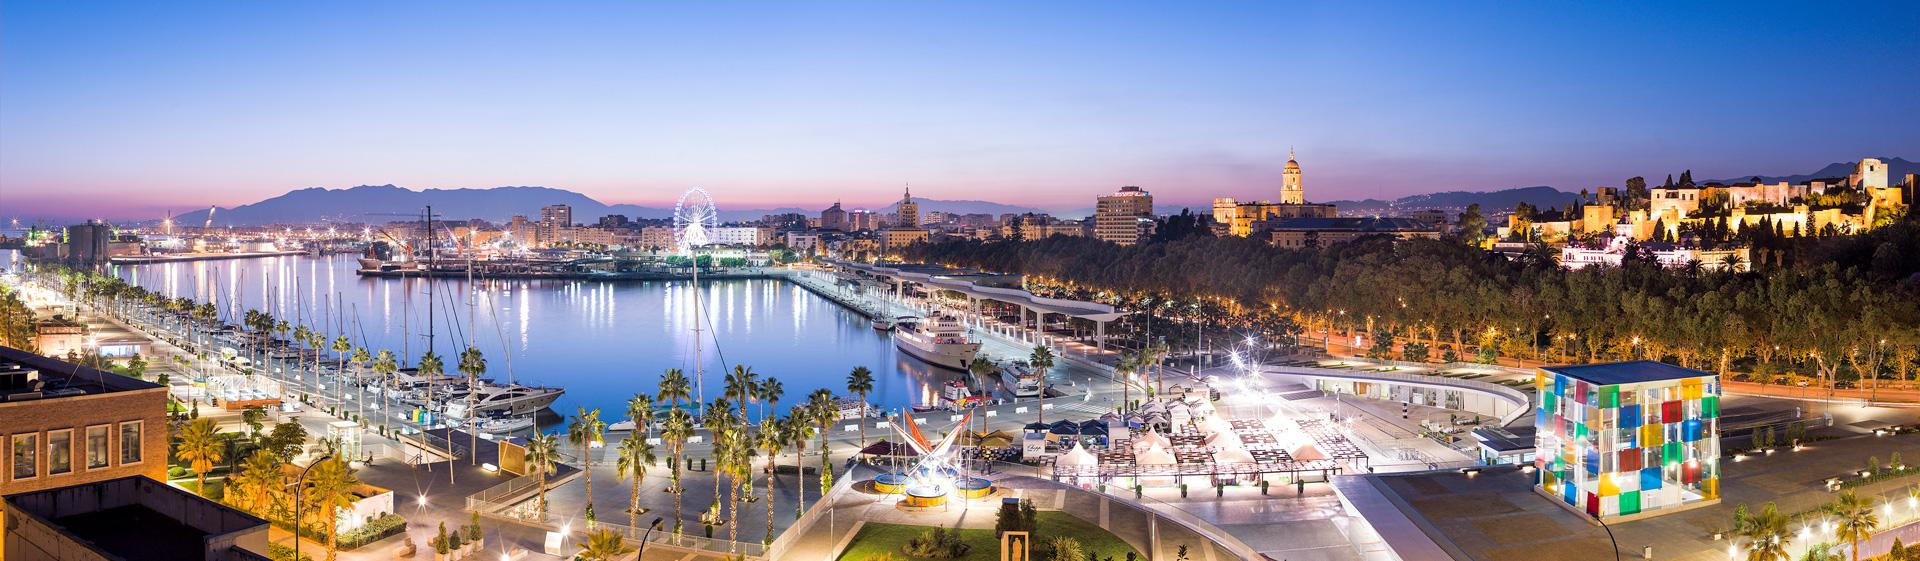 Inmobiliarias de Málaga